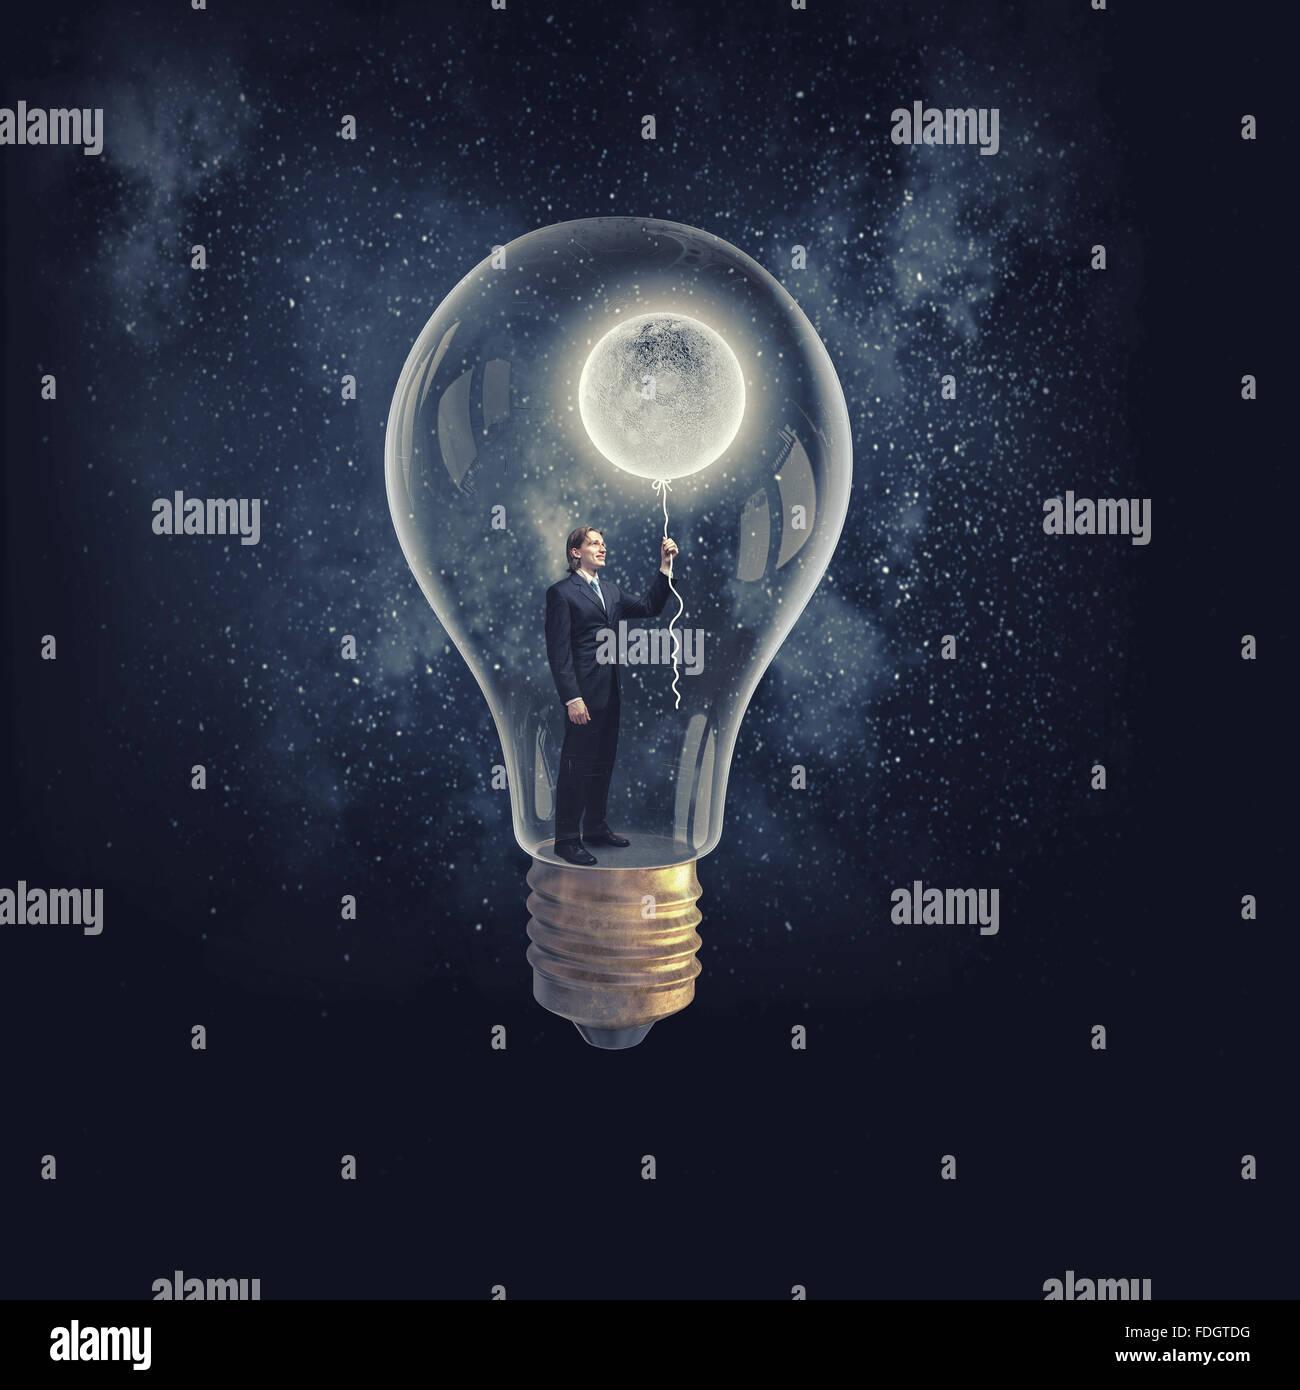 businessman inside of glass light bulb with moon balloon on dark